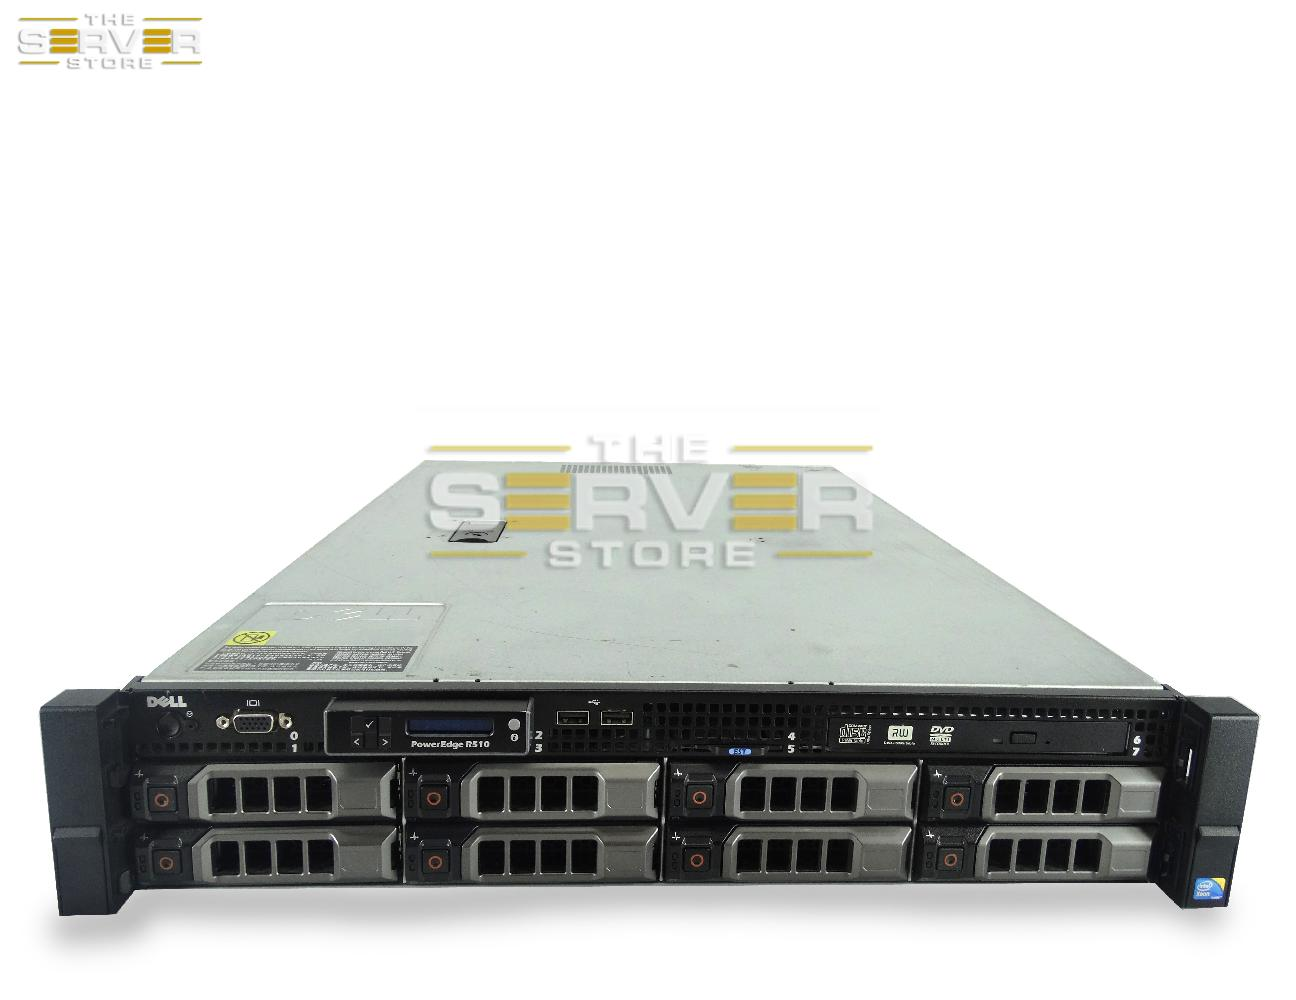 Dell PowerEdge R510 8x 2U LFF Server